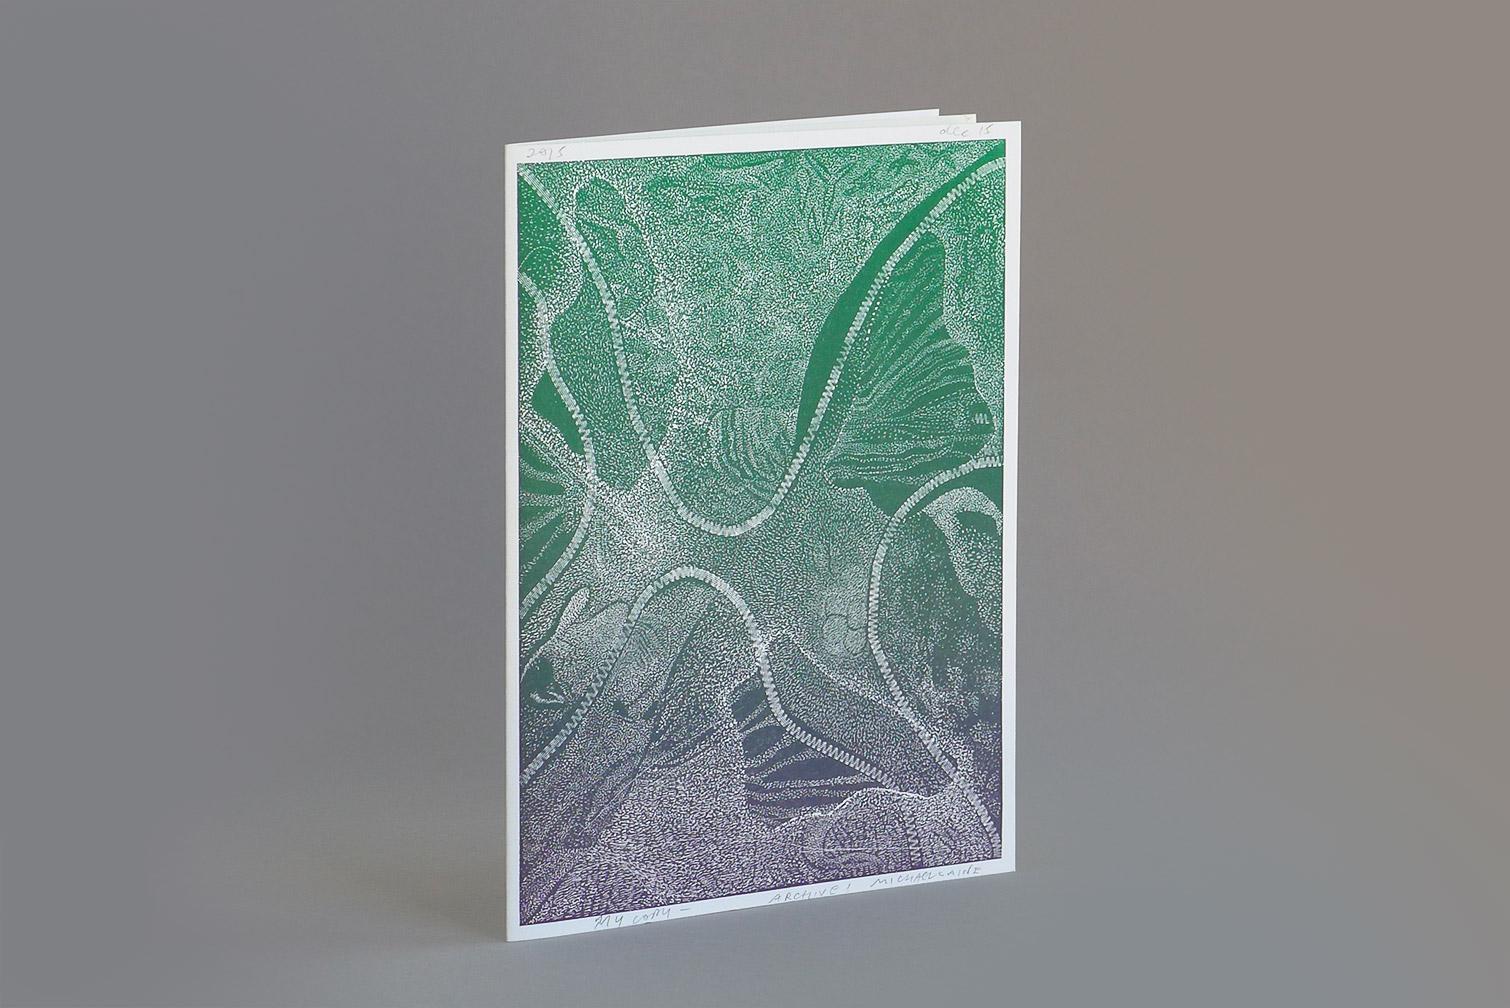 michael-caine-petropolis-print-L1660229.jpg